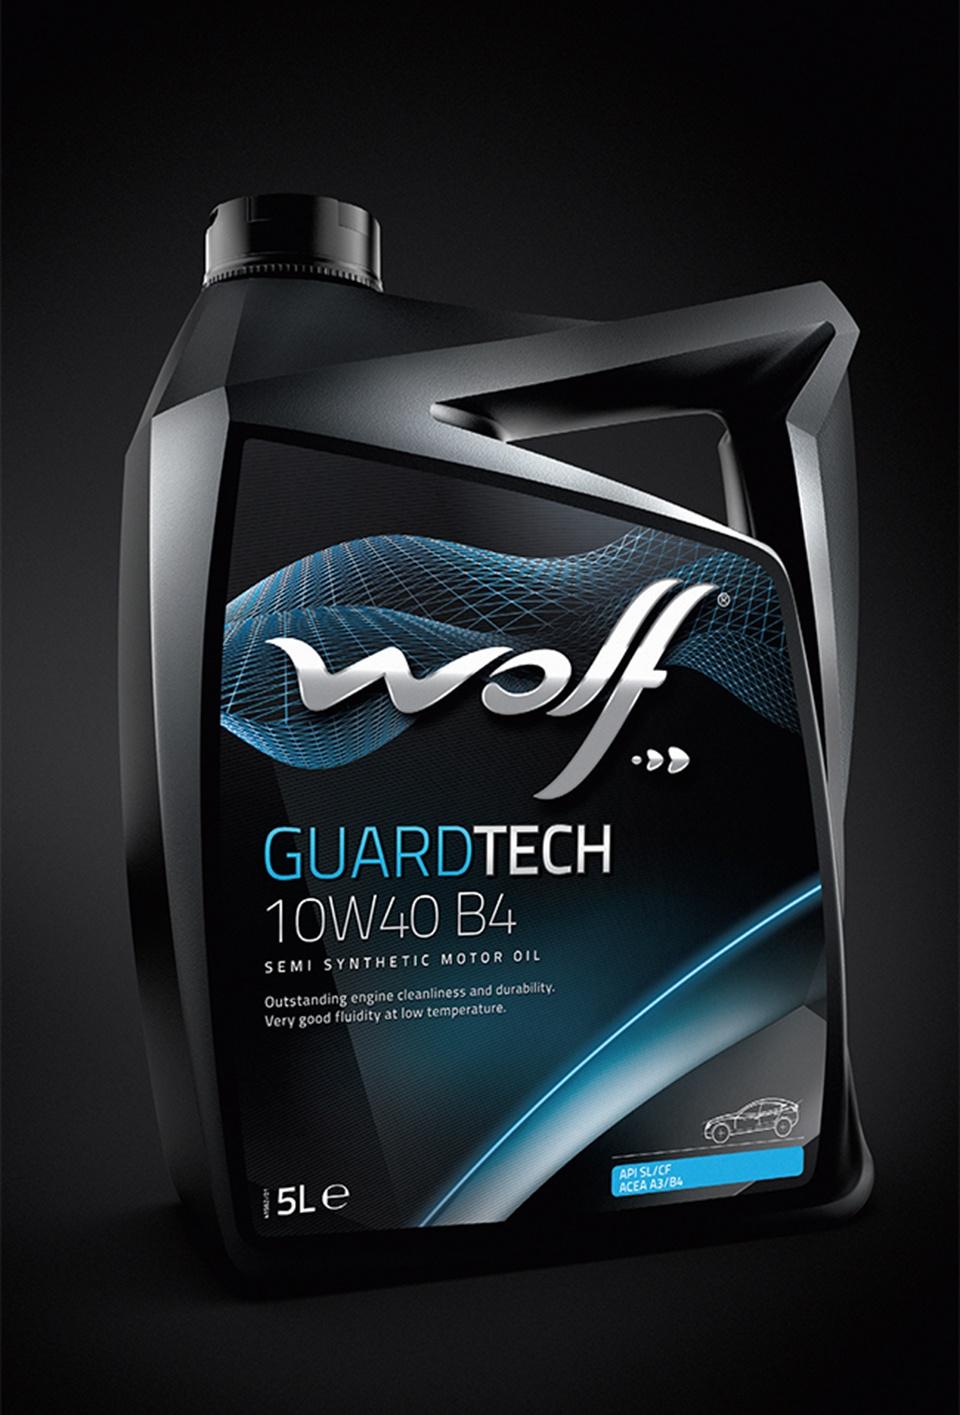 06-guardtech-10W40-B4